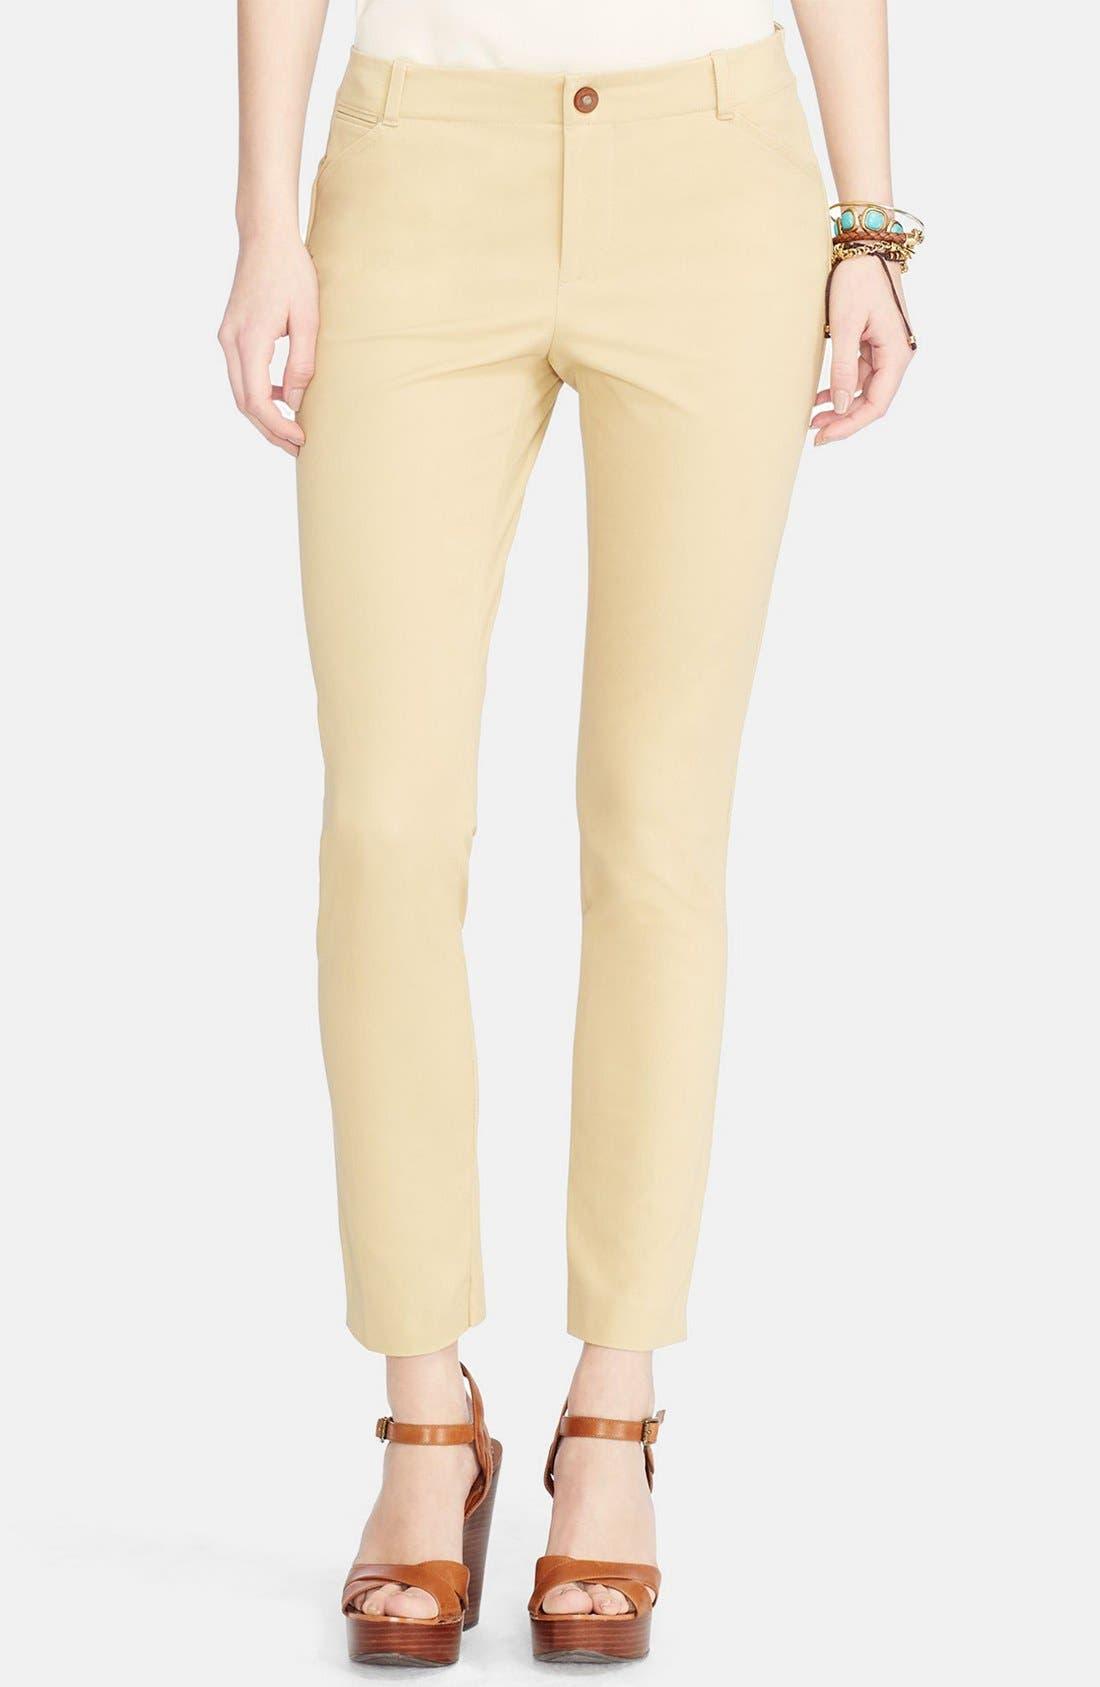 Main Image - Lauren Ralph Lauren Stretch Cotton Skinny Pants (Regular & Petite)